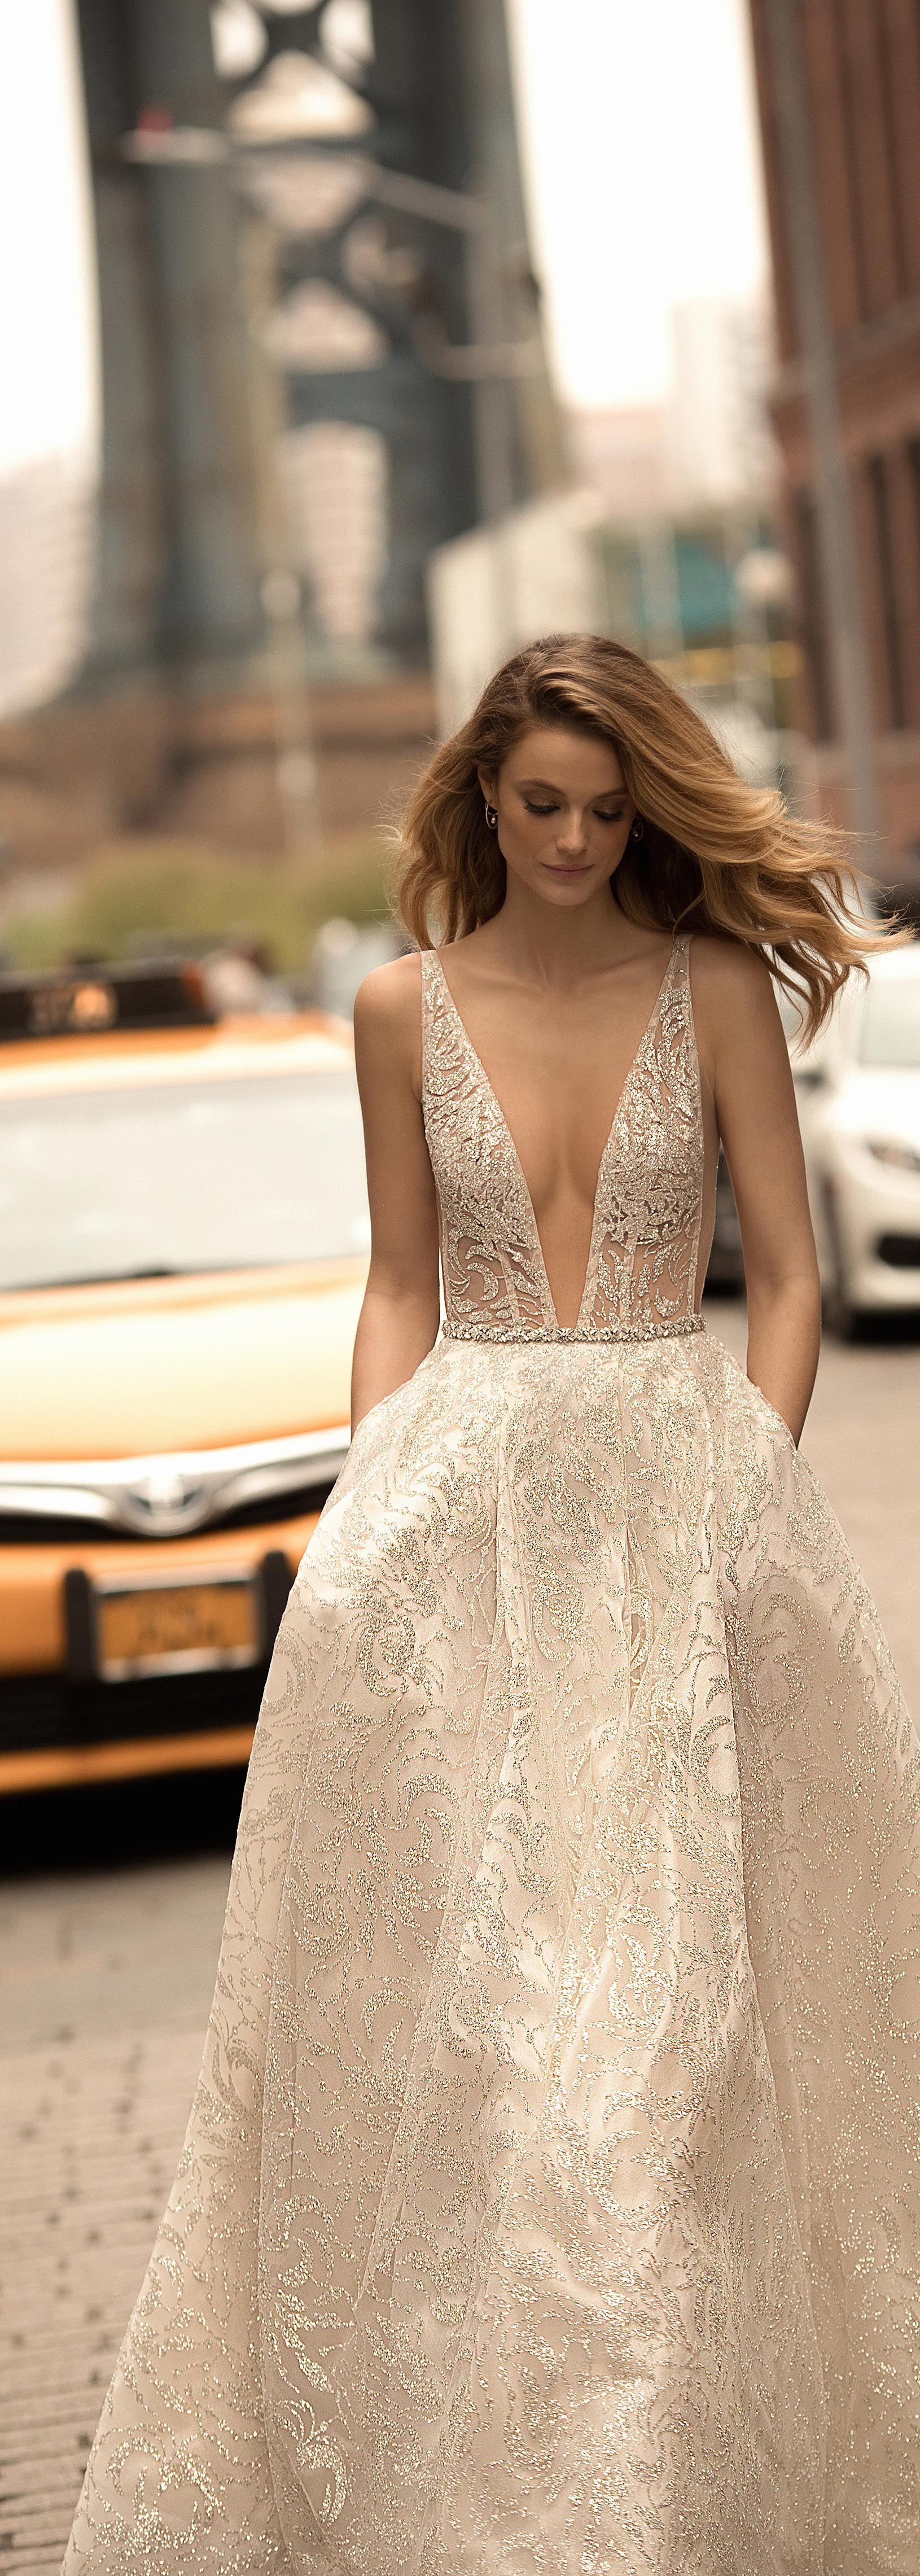 BERTA 2018 bridal collection. Style 18-03 | BERTA 2018 | Pinterest ...